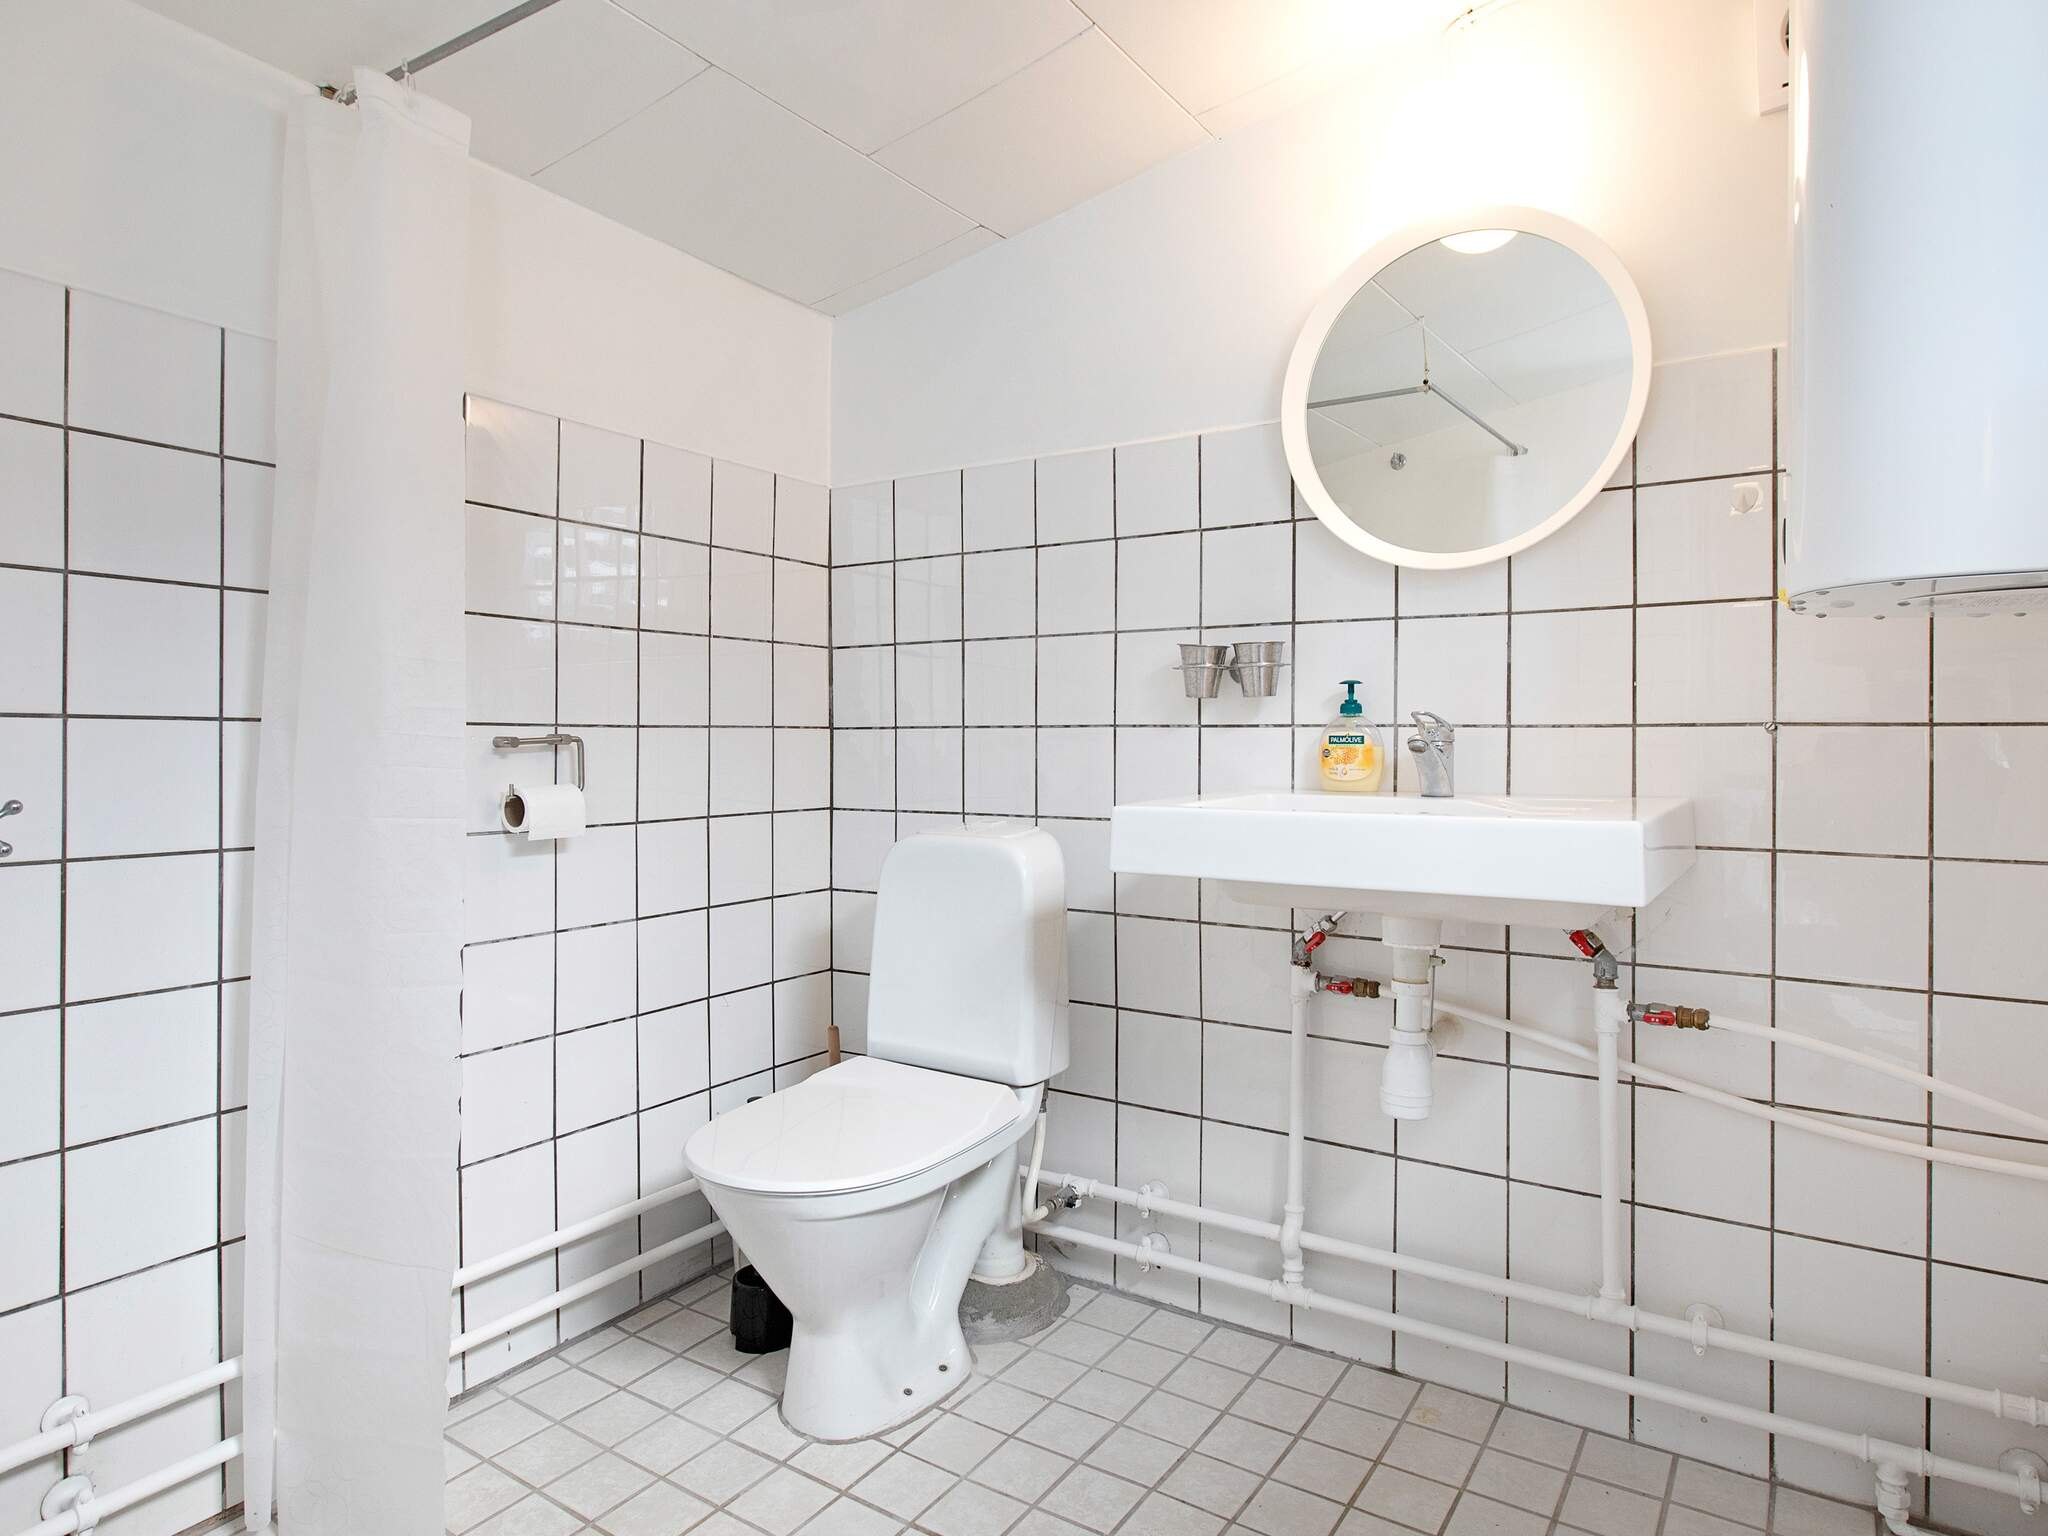 Ferienhaus Vig Lyng (2552234), Vig, , Westseeland, Dänemark, Bild 8